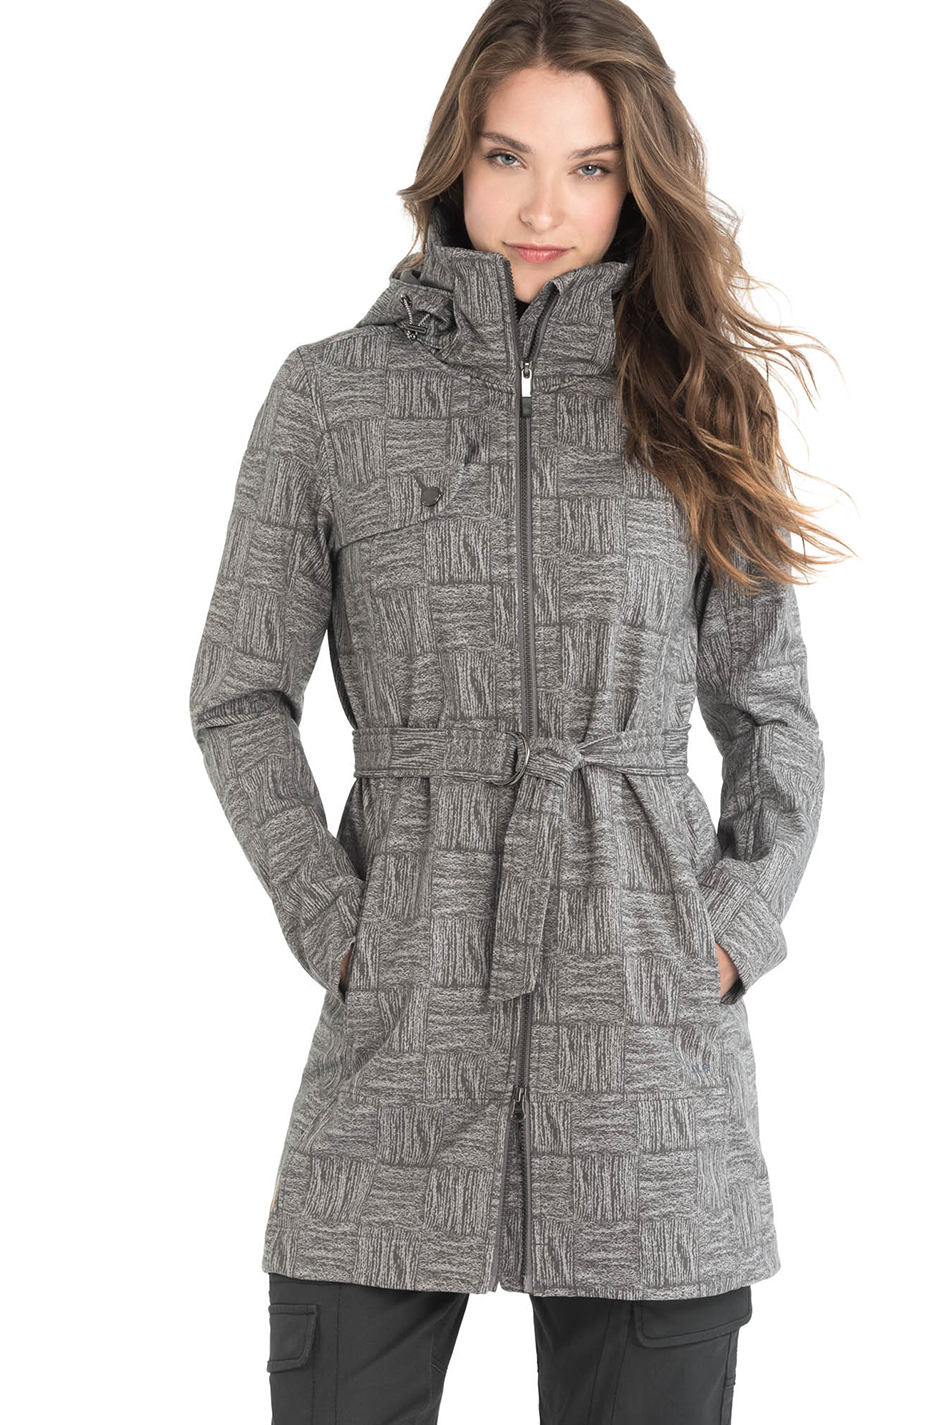 Lole Glowing Rain Coat - Stylish, Modern Rain Coat